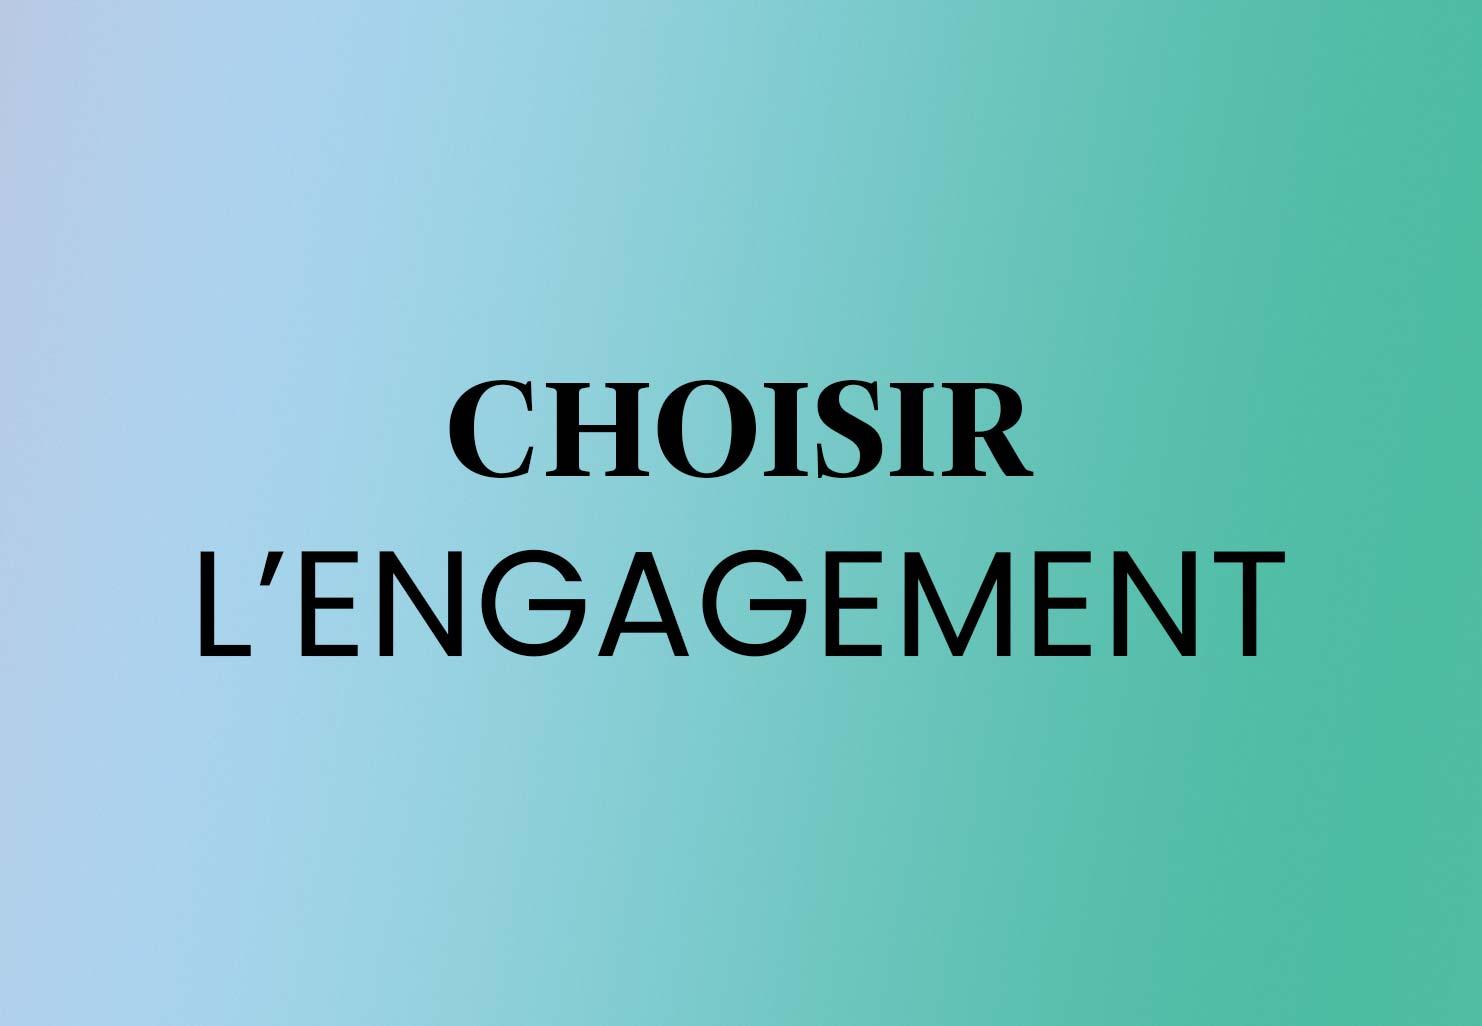 Choisir l'engagement